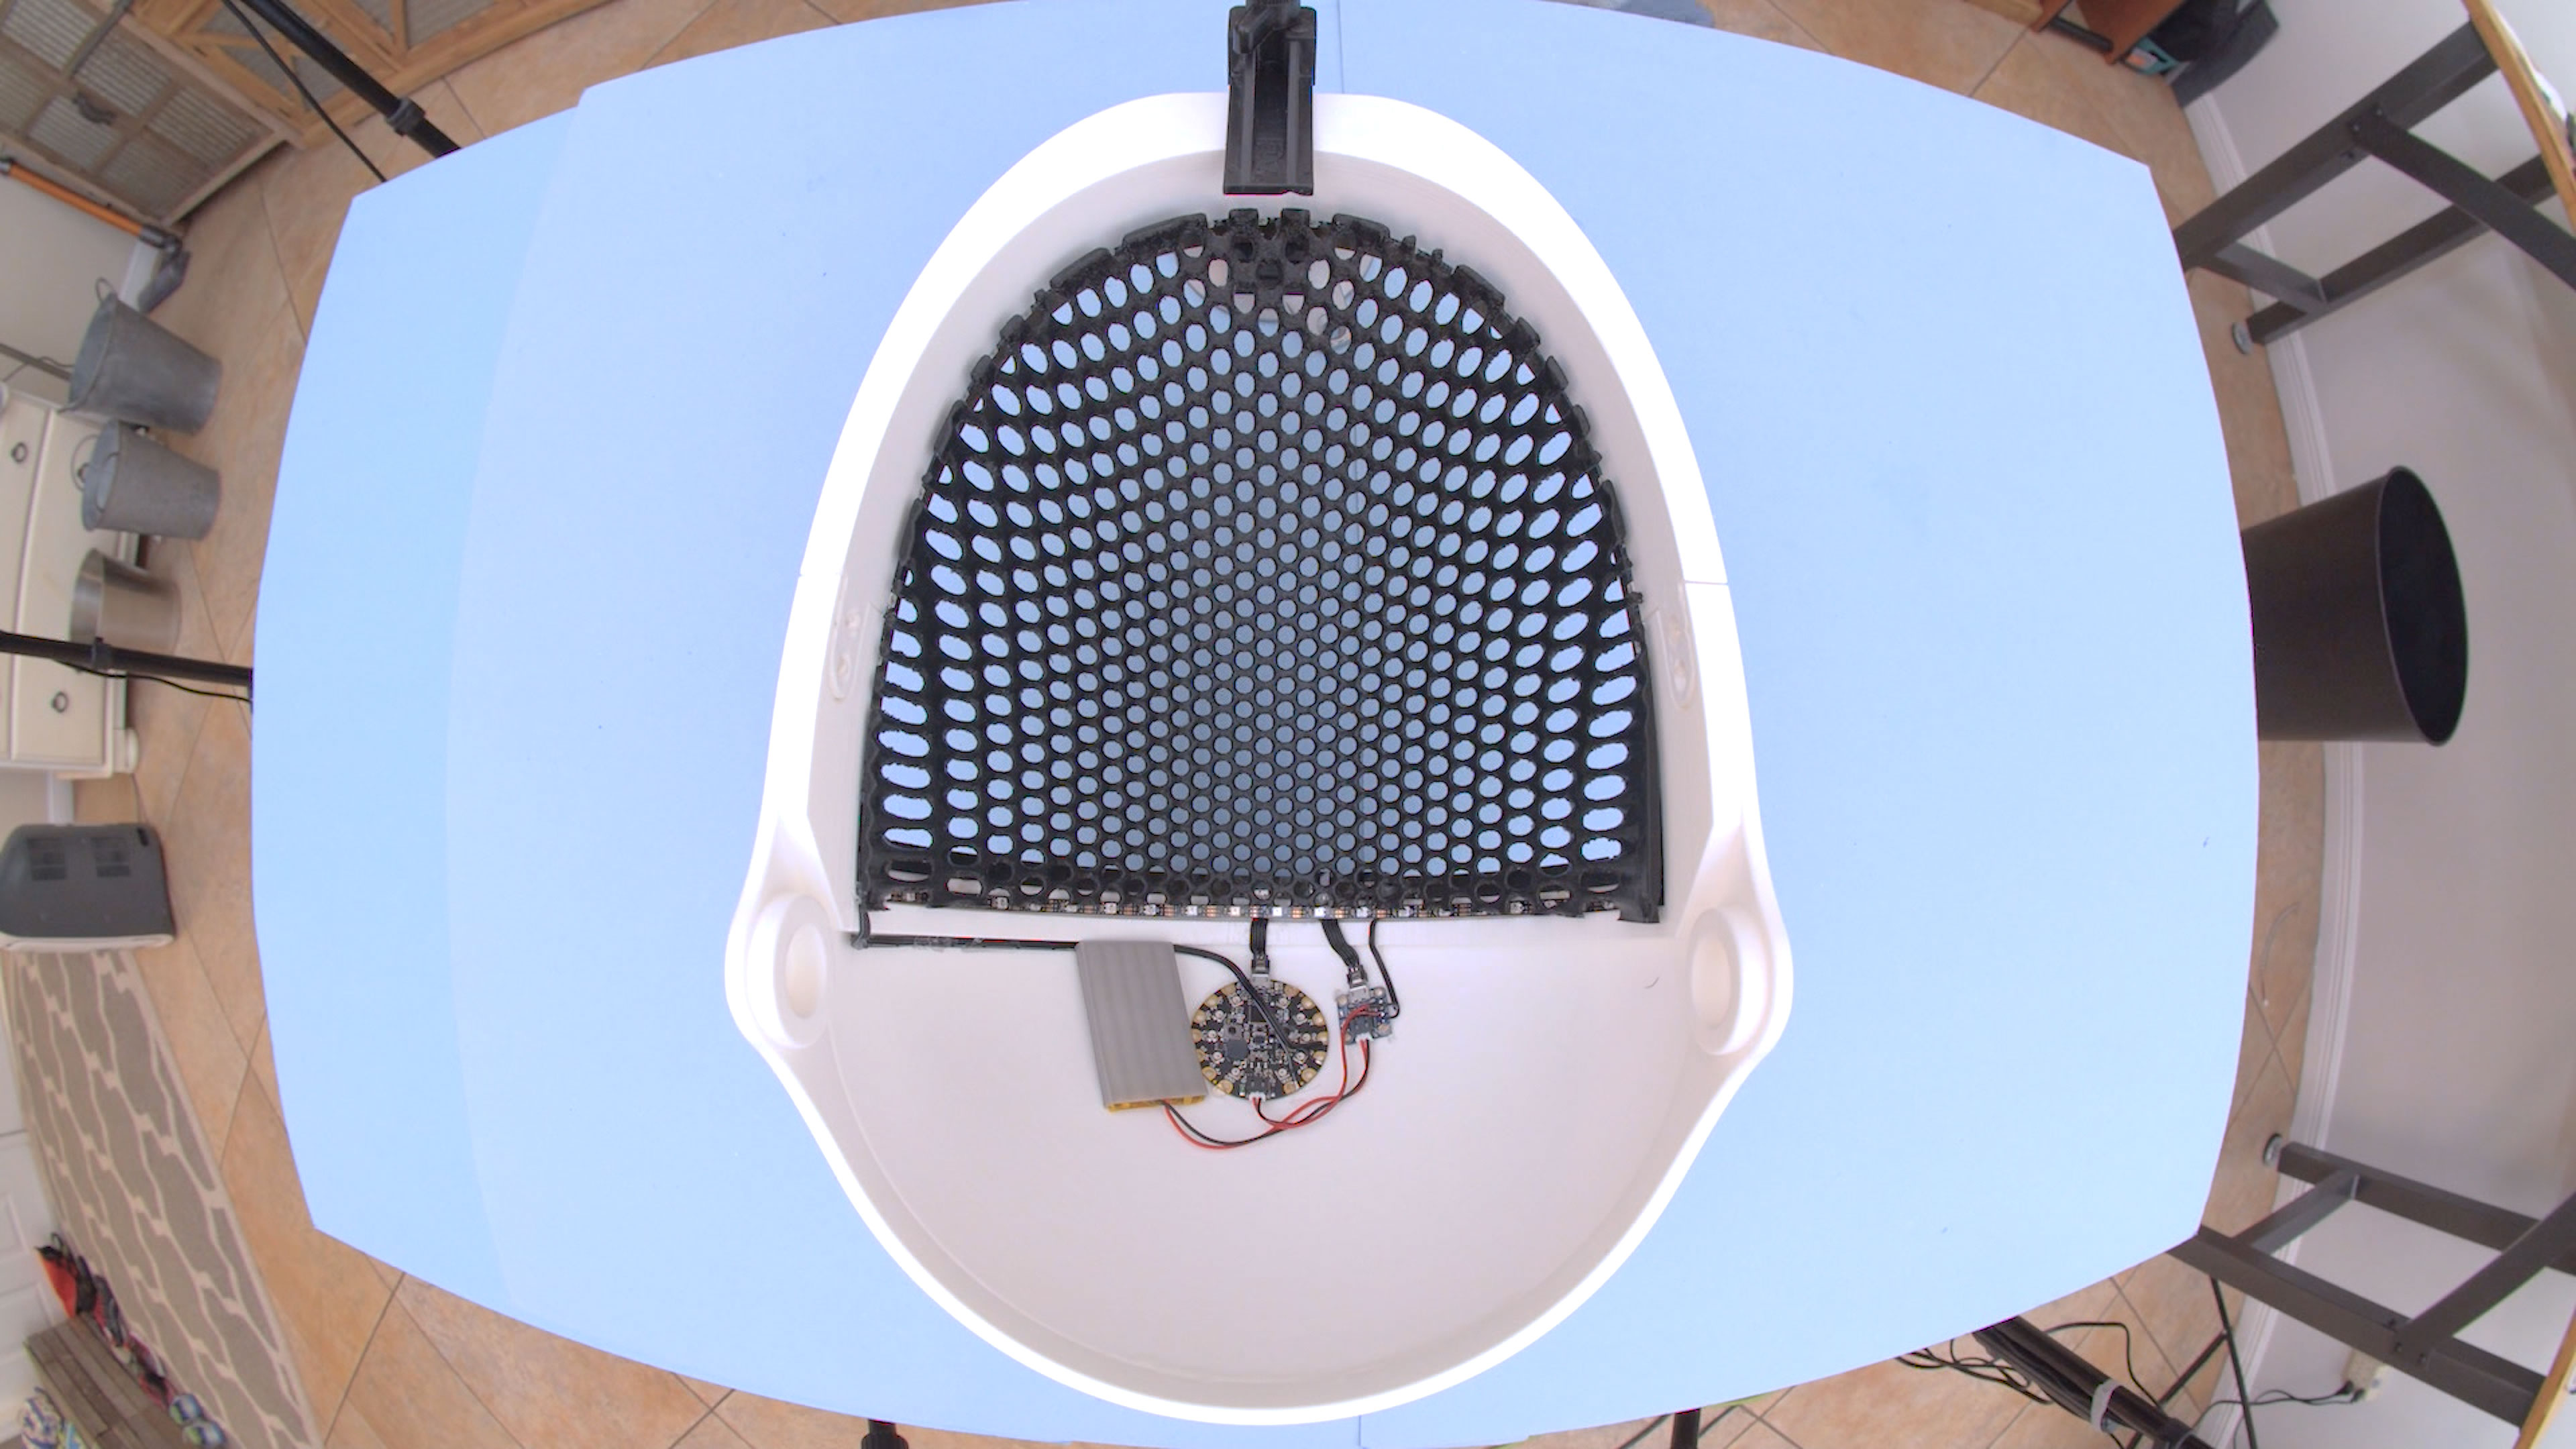 3d_printing_visor-mounted.jpg